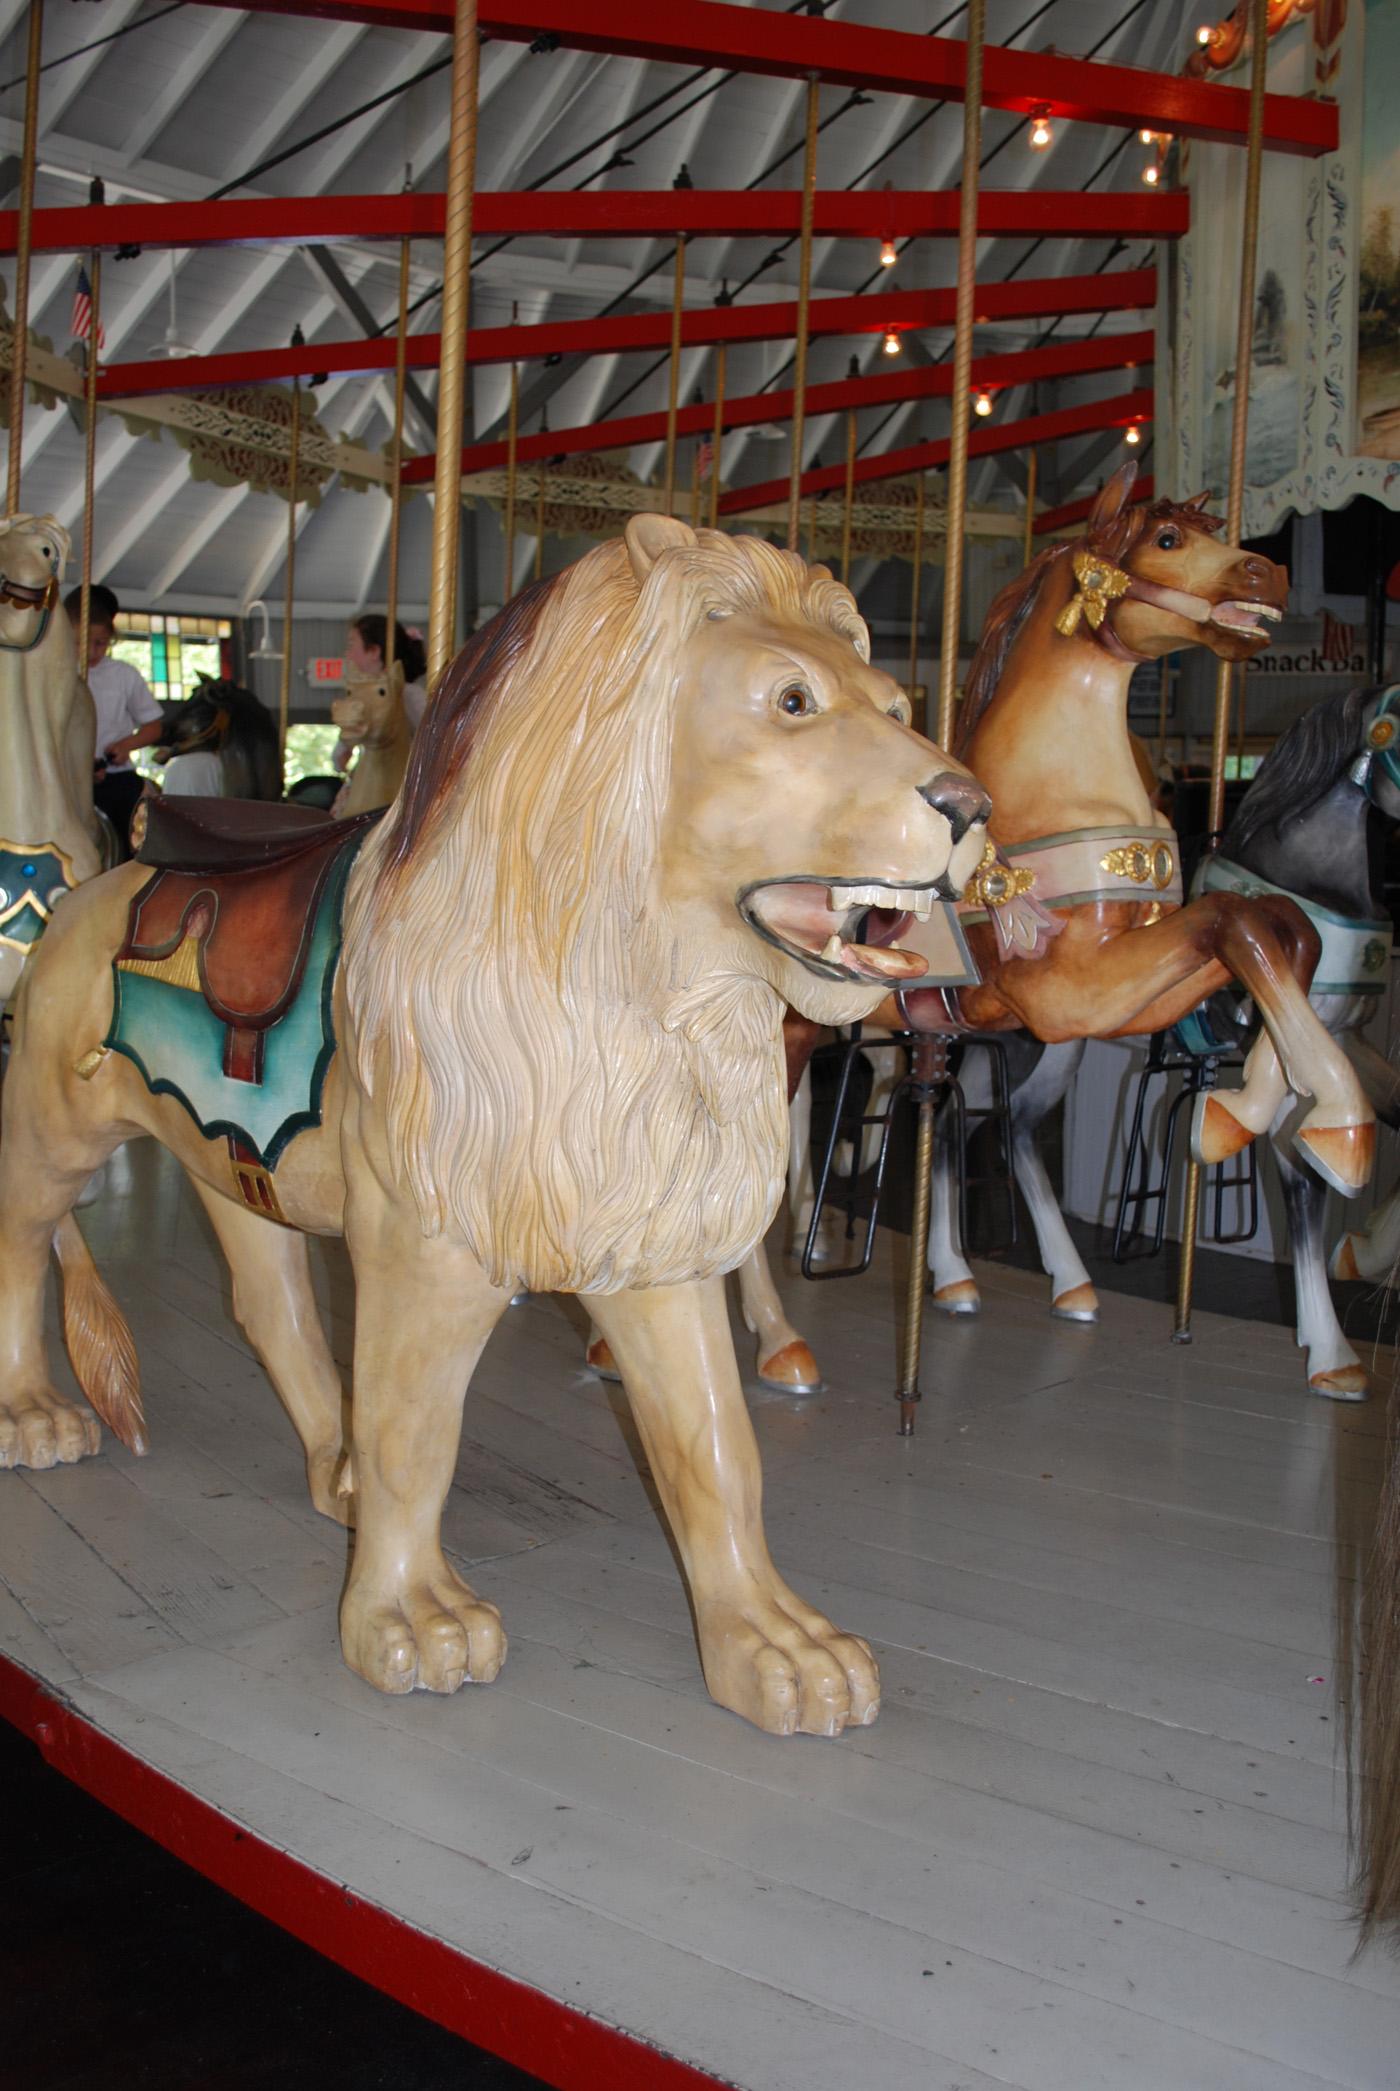 1895-Looff-carousel-lion-Slater-Park-RI-073